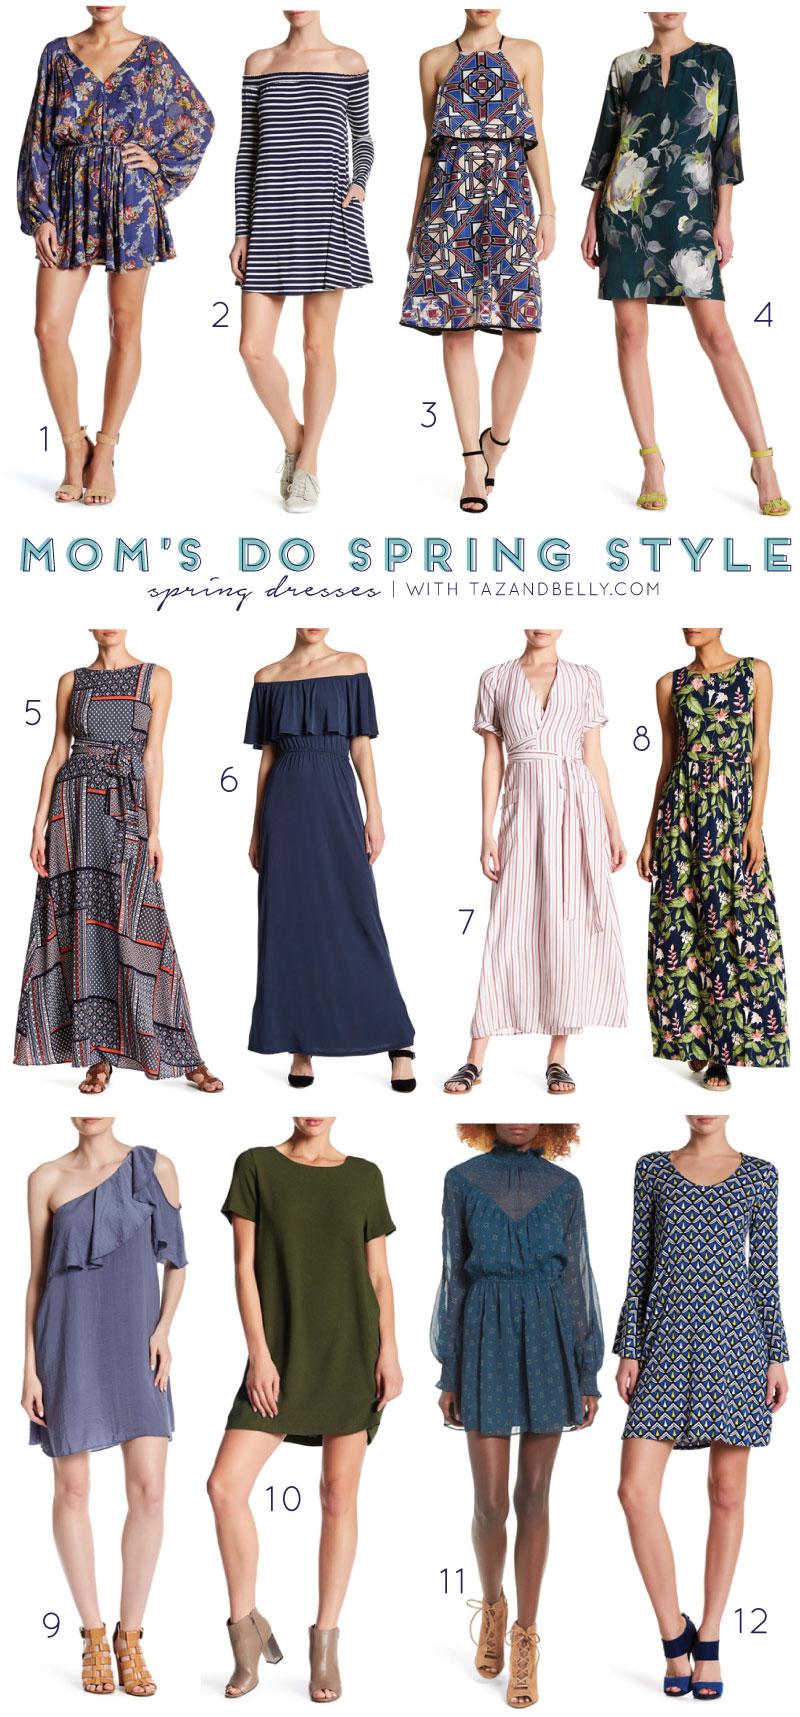 Mom's Do Spring Style | tazandbelly.com